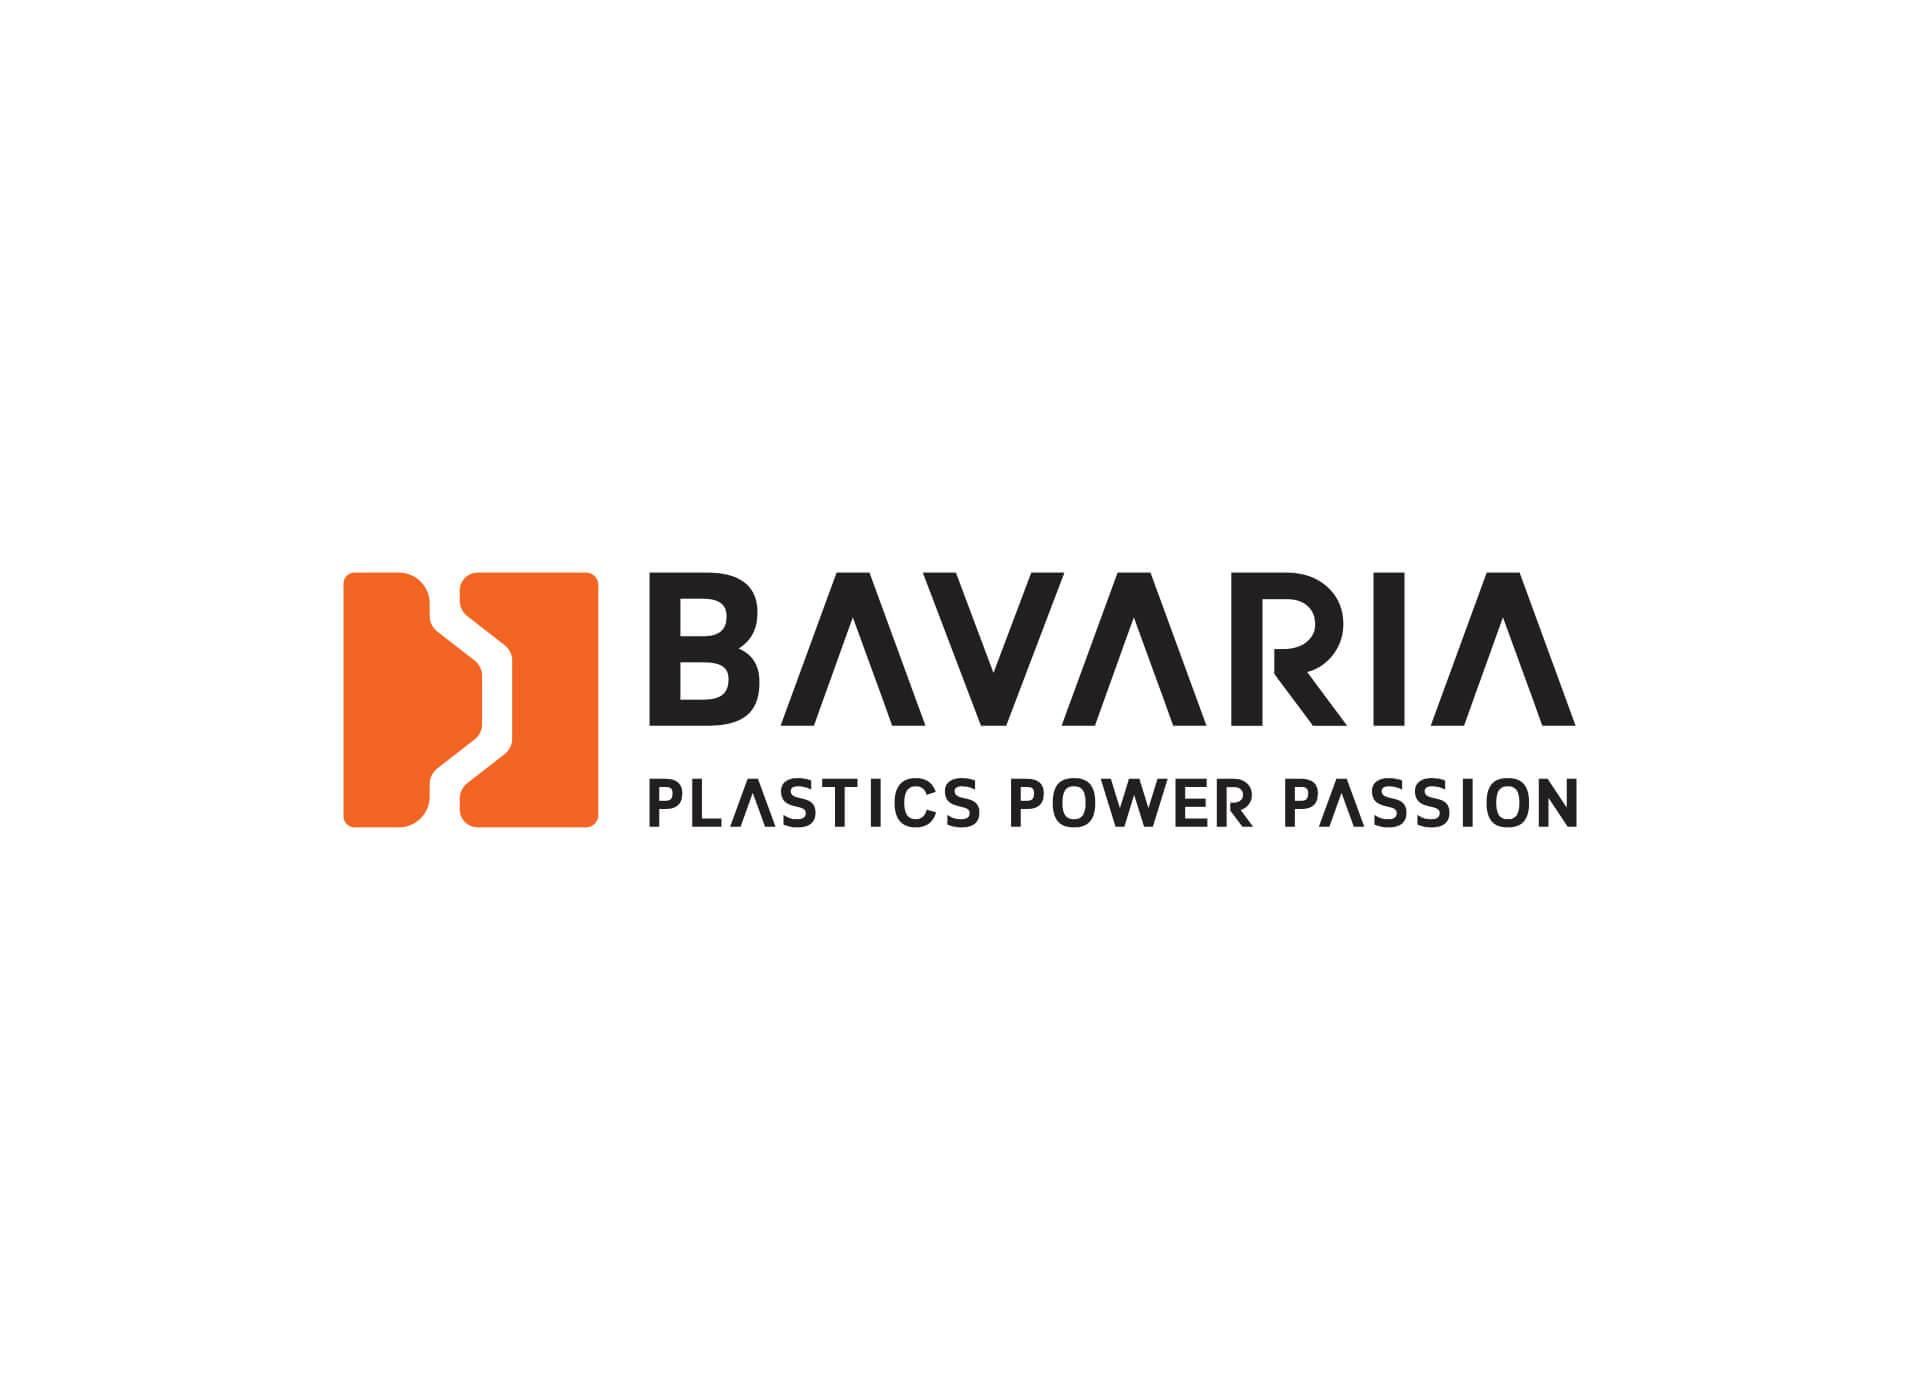 Bavaria Plastics portofoliu inoveo logo pozitiv